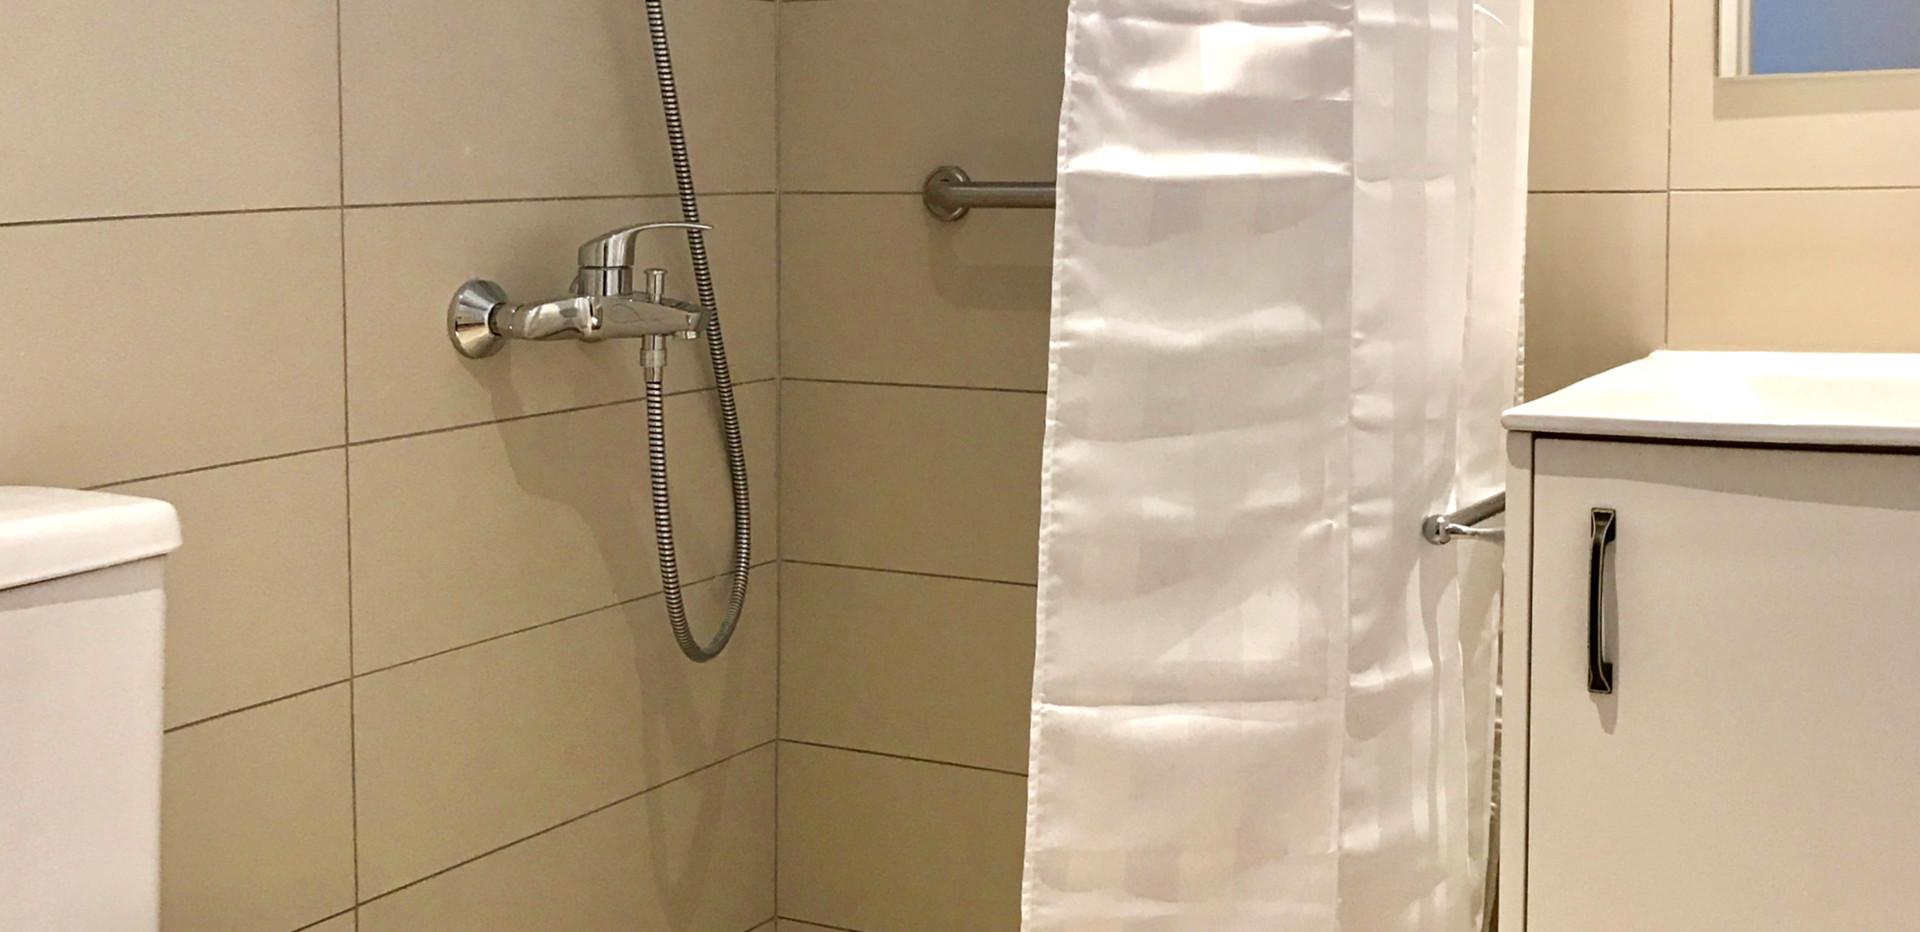 CAROB accommodation limassol cyprus toil